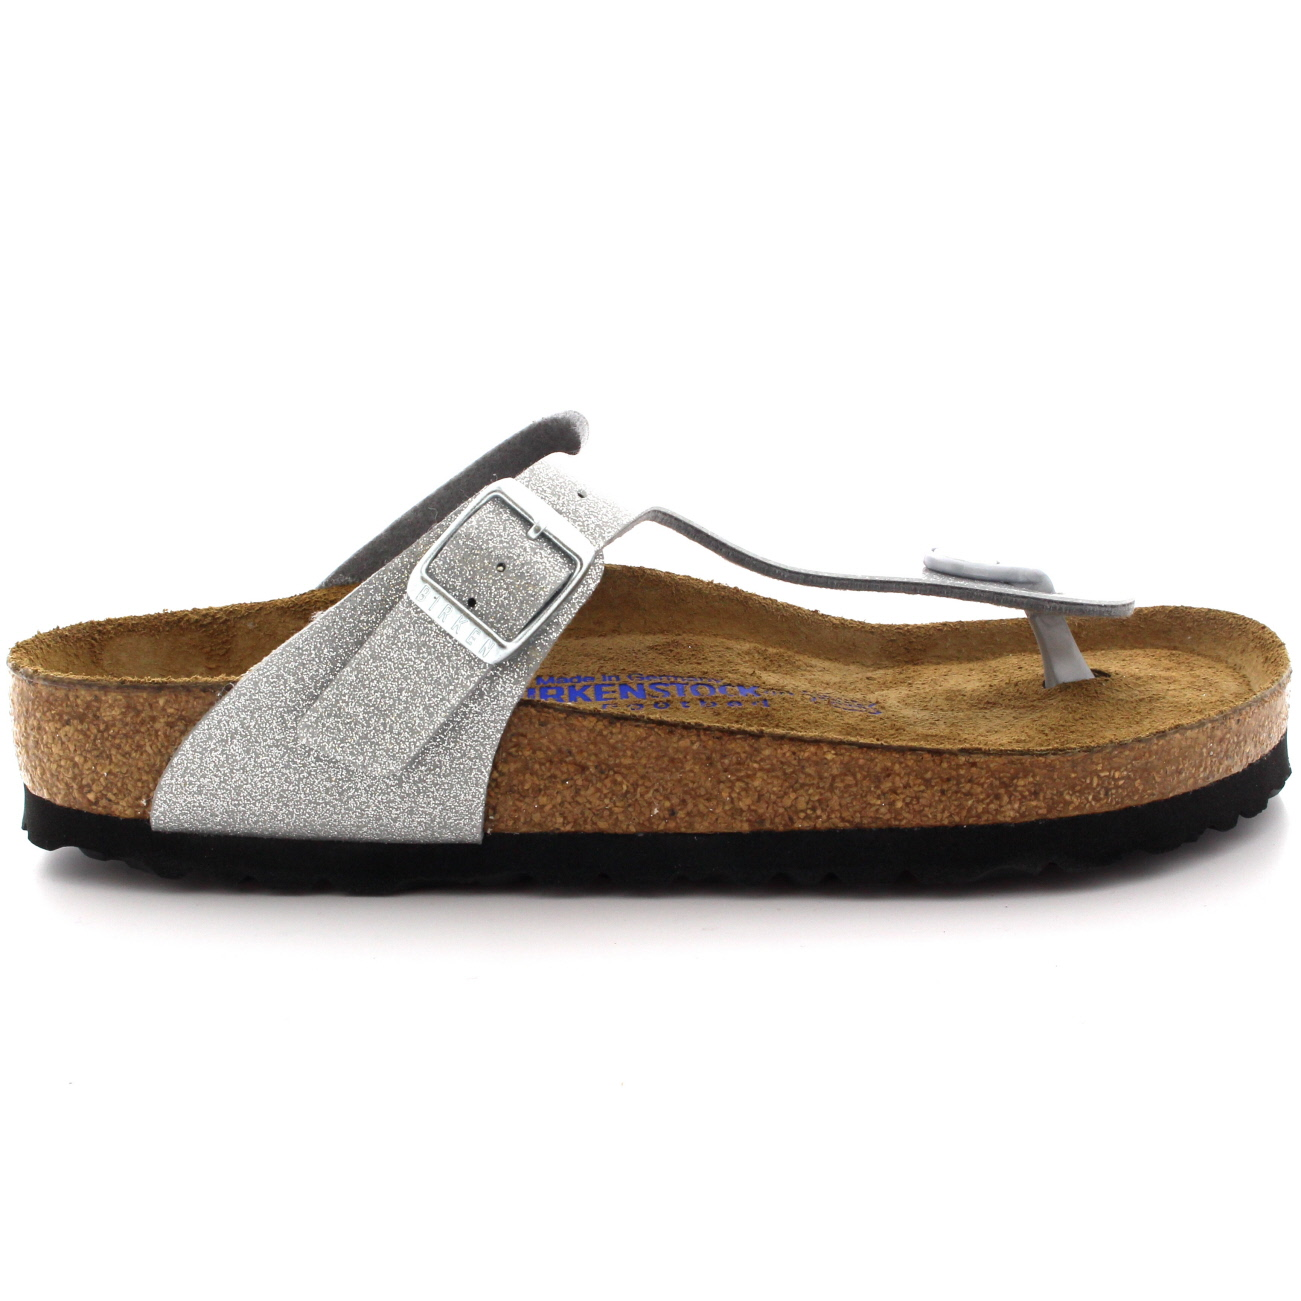 07c11c50e10b Birkenstock Birki Eva Sandals For Women Live Life Outdoors